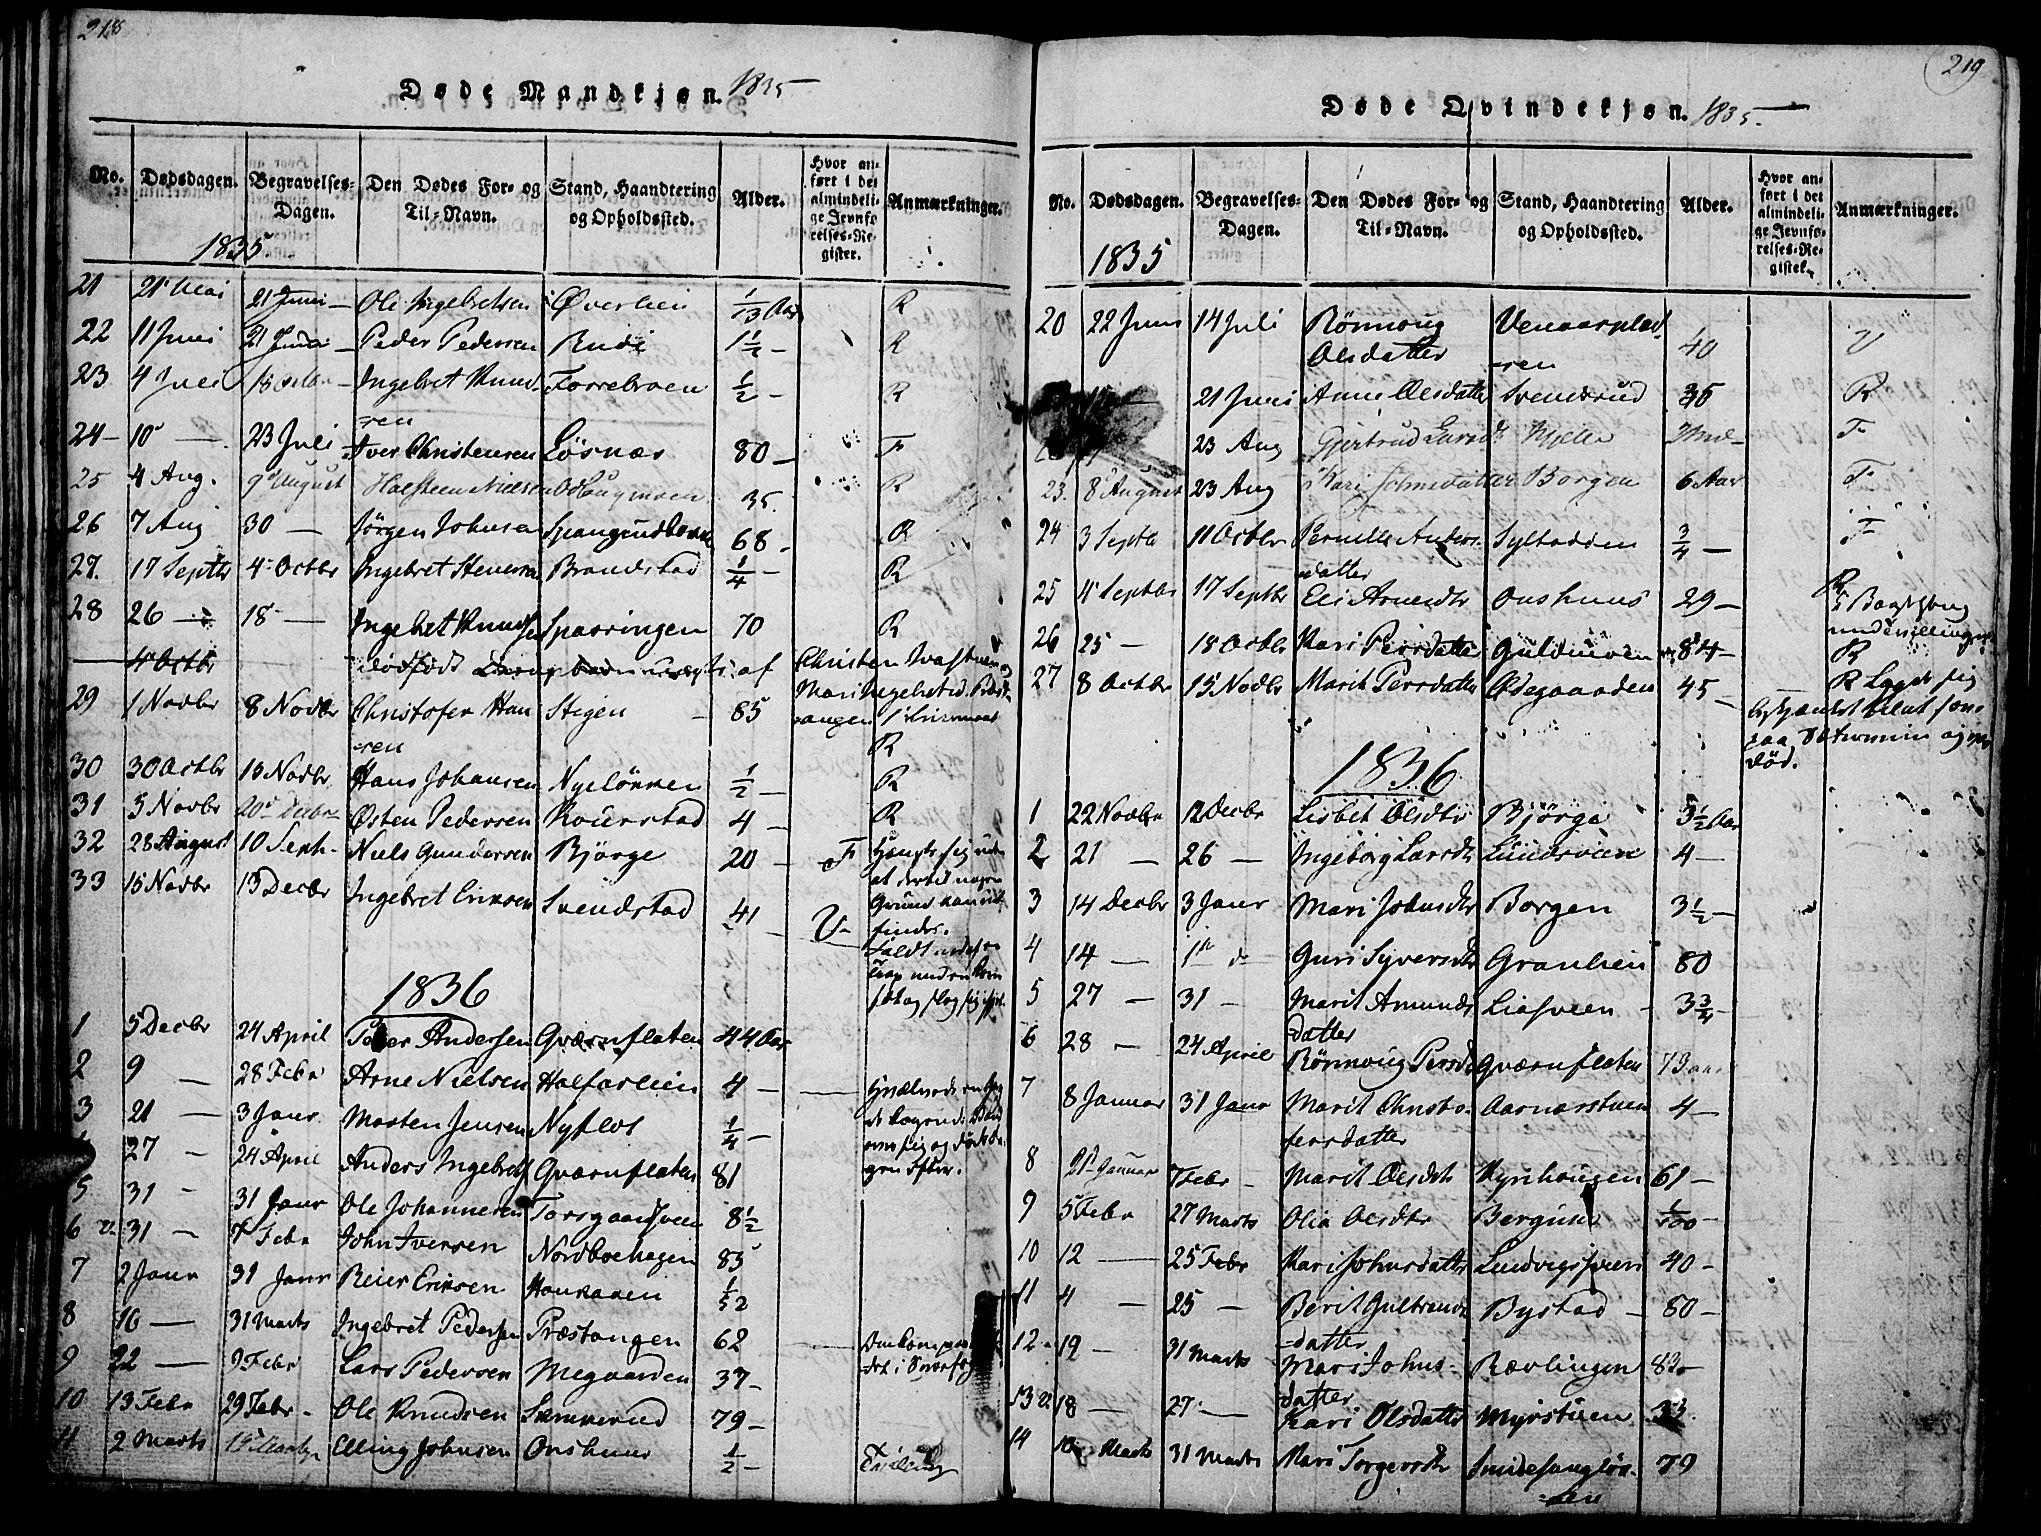 SAH, Ringebu prestekontor, Ministerialbok nr. 4, 1821-1839, s. 218-219